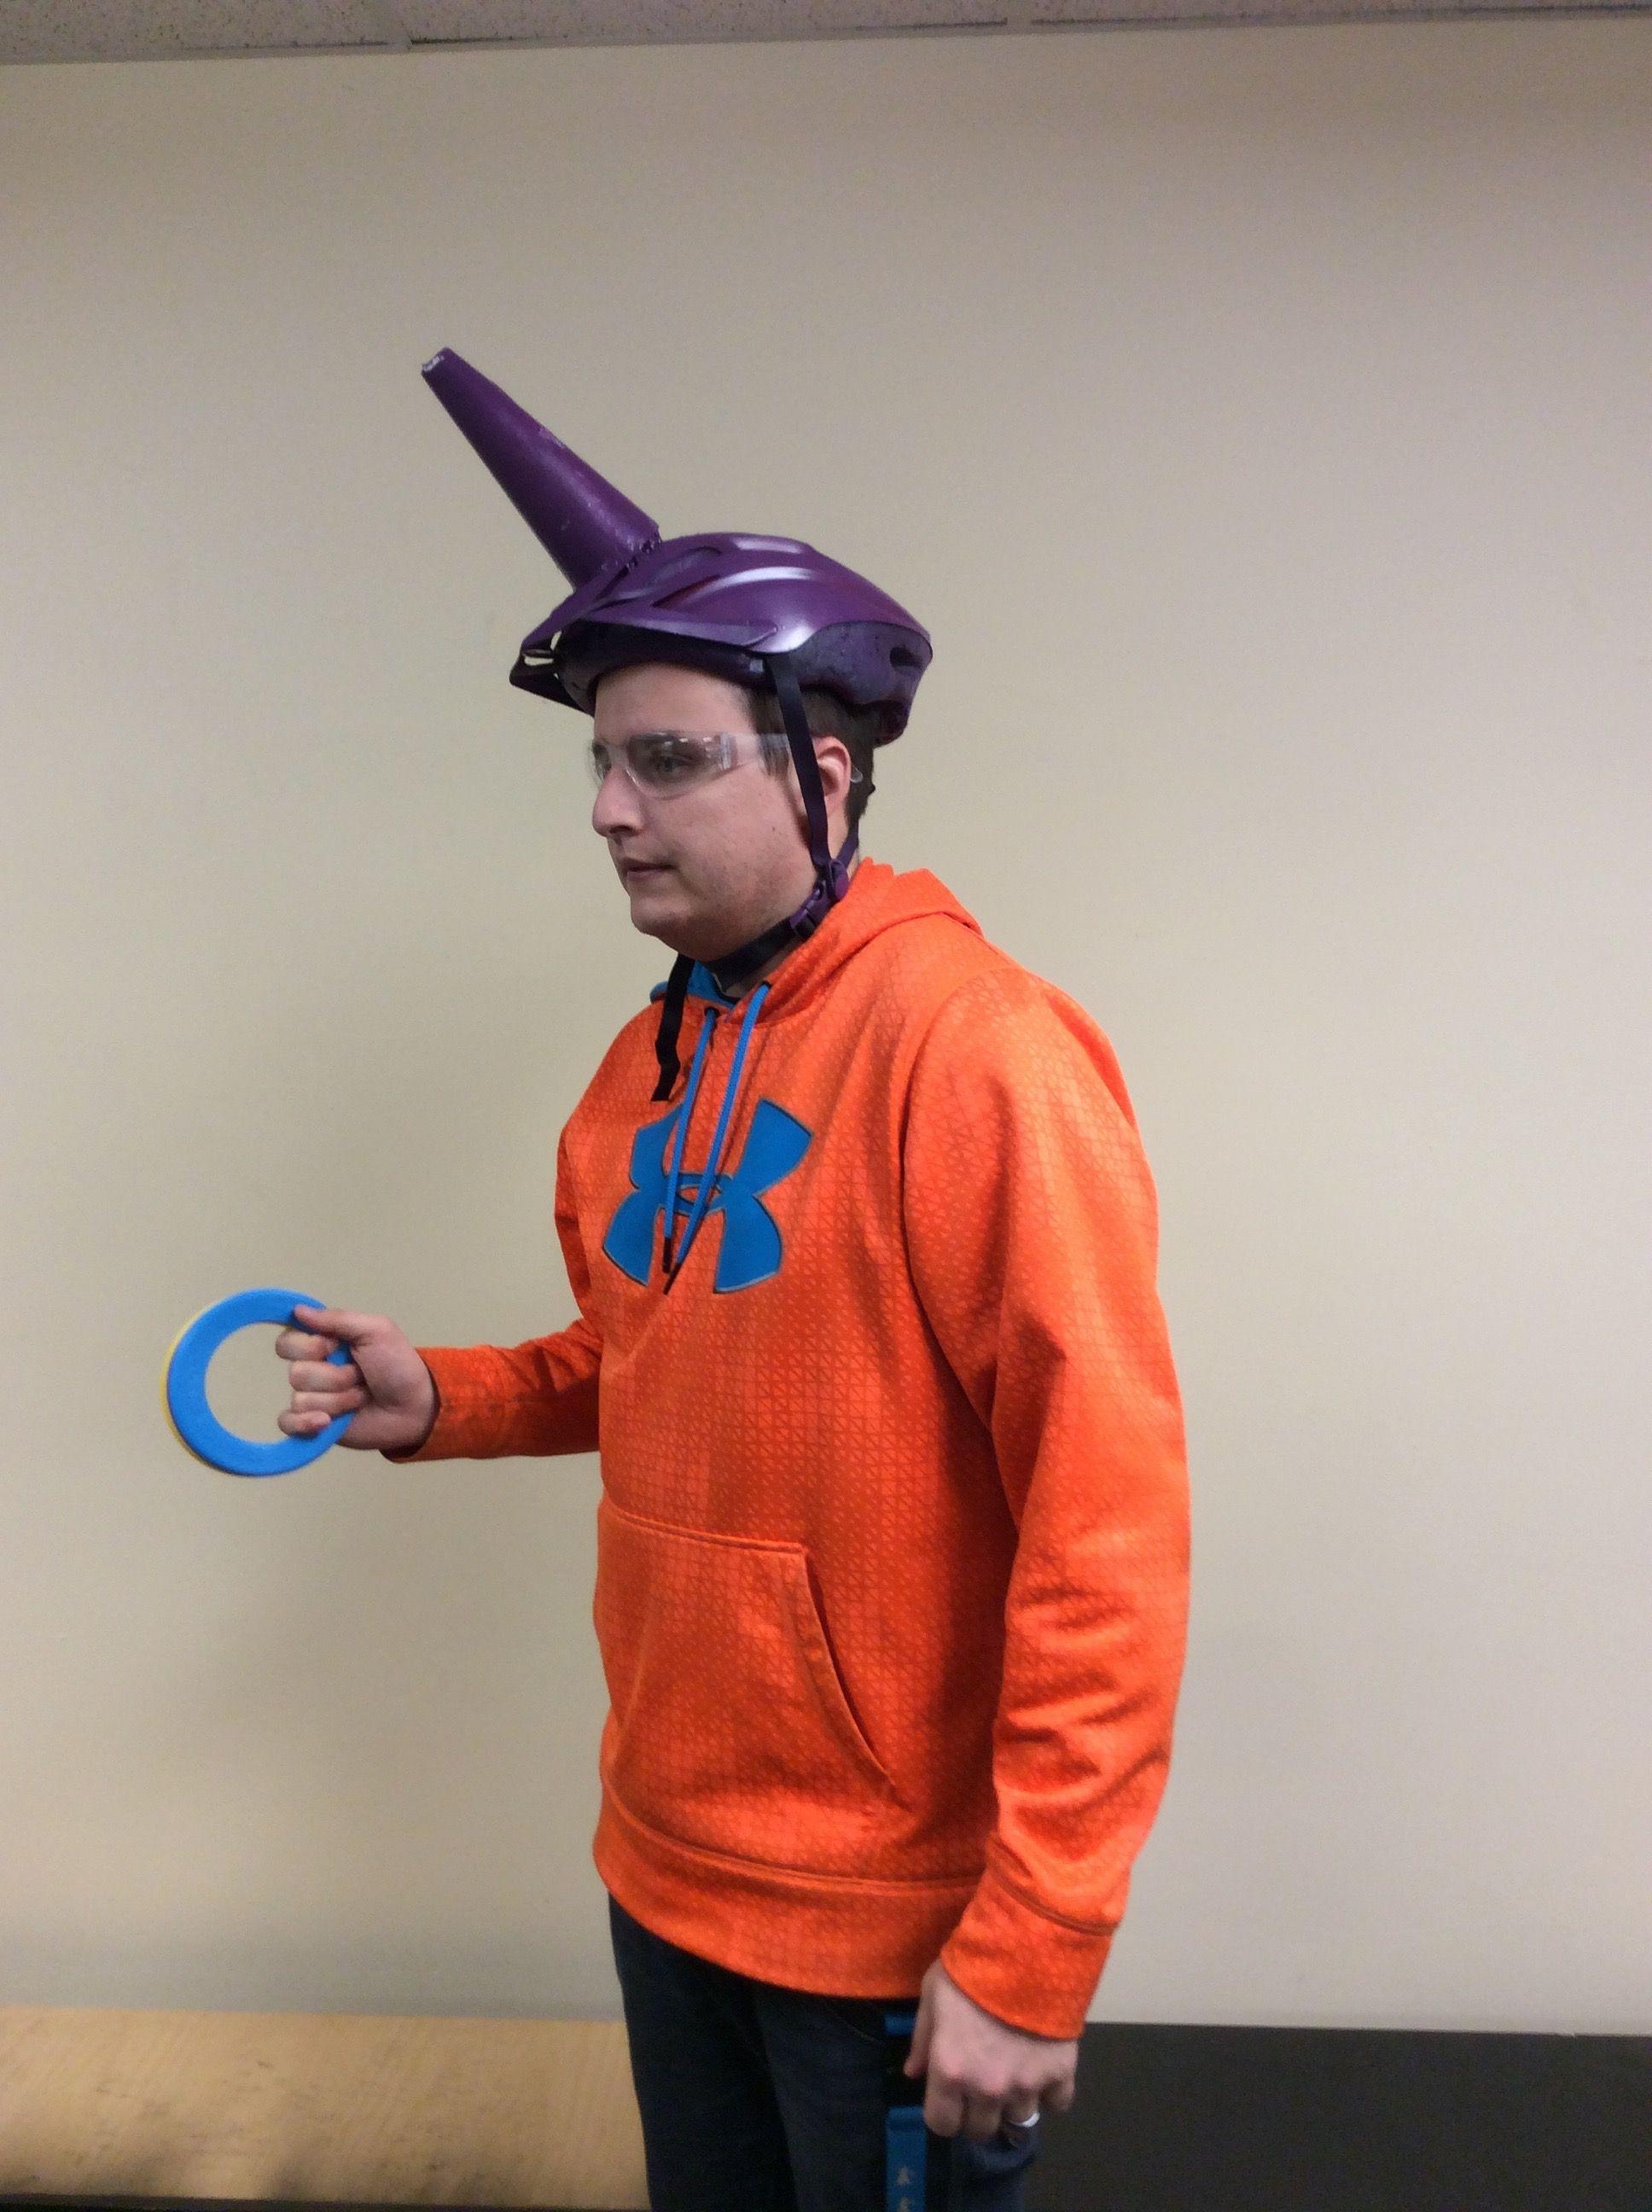 Unicorn Ring Toss Fun Ninja Youth Group Games Meeting Ideas